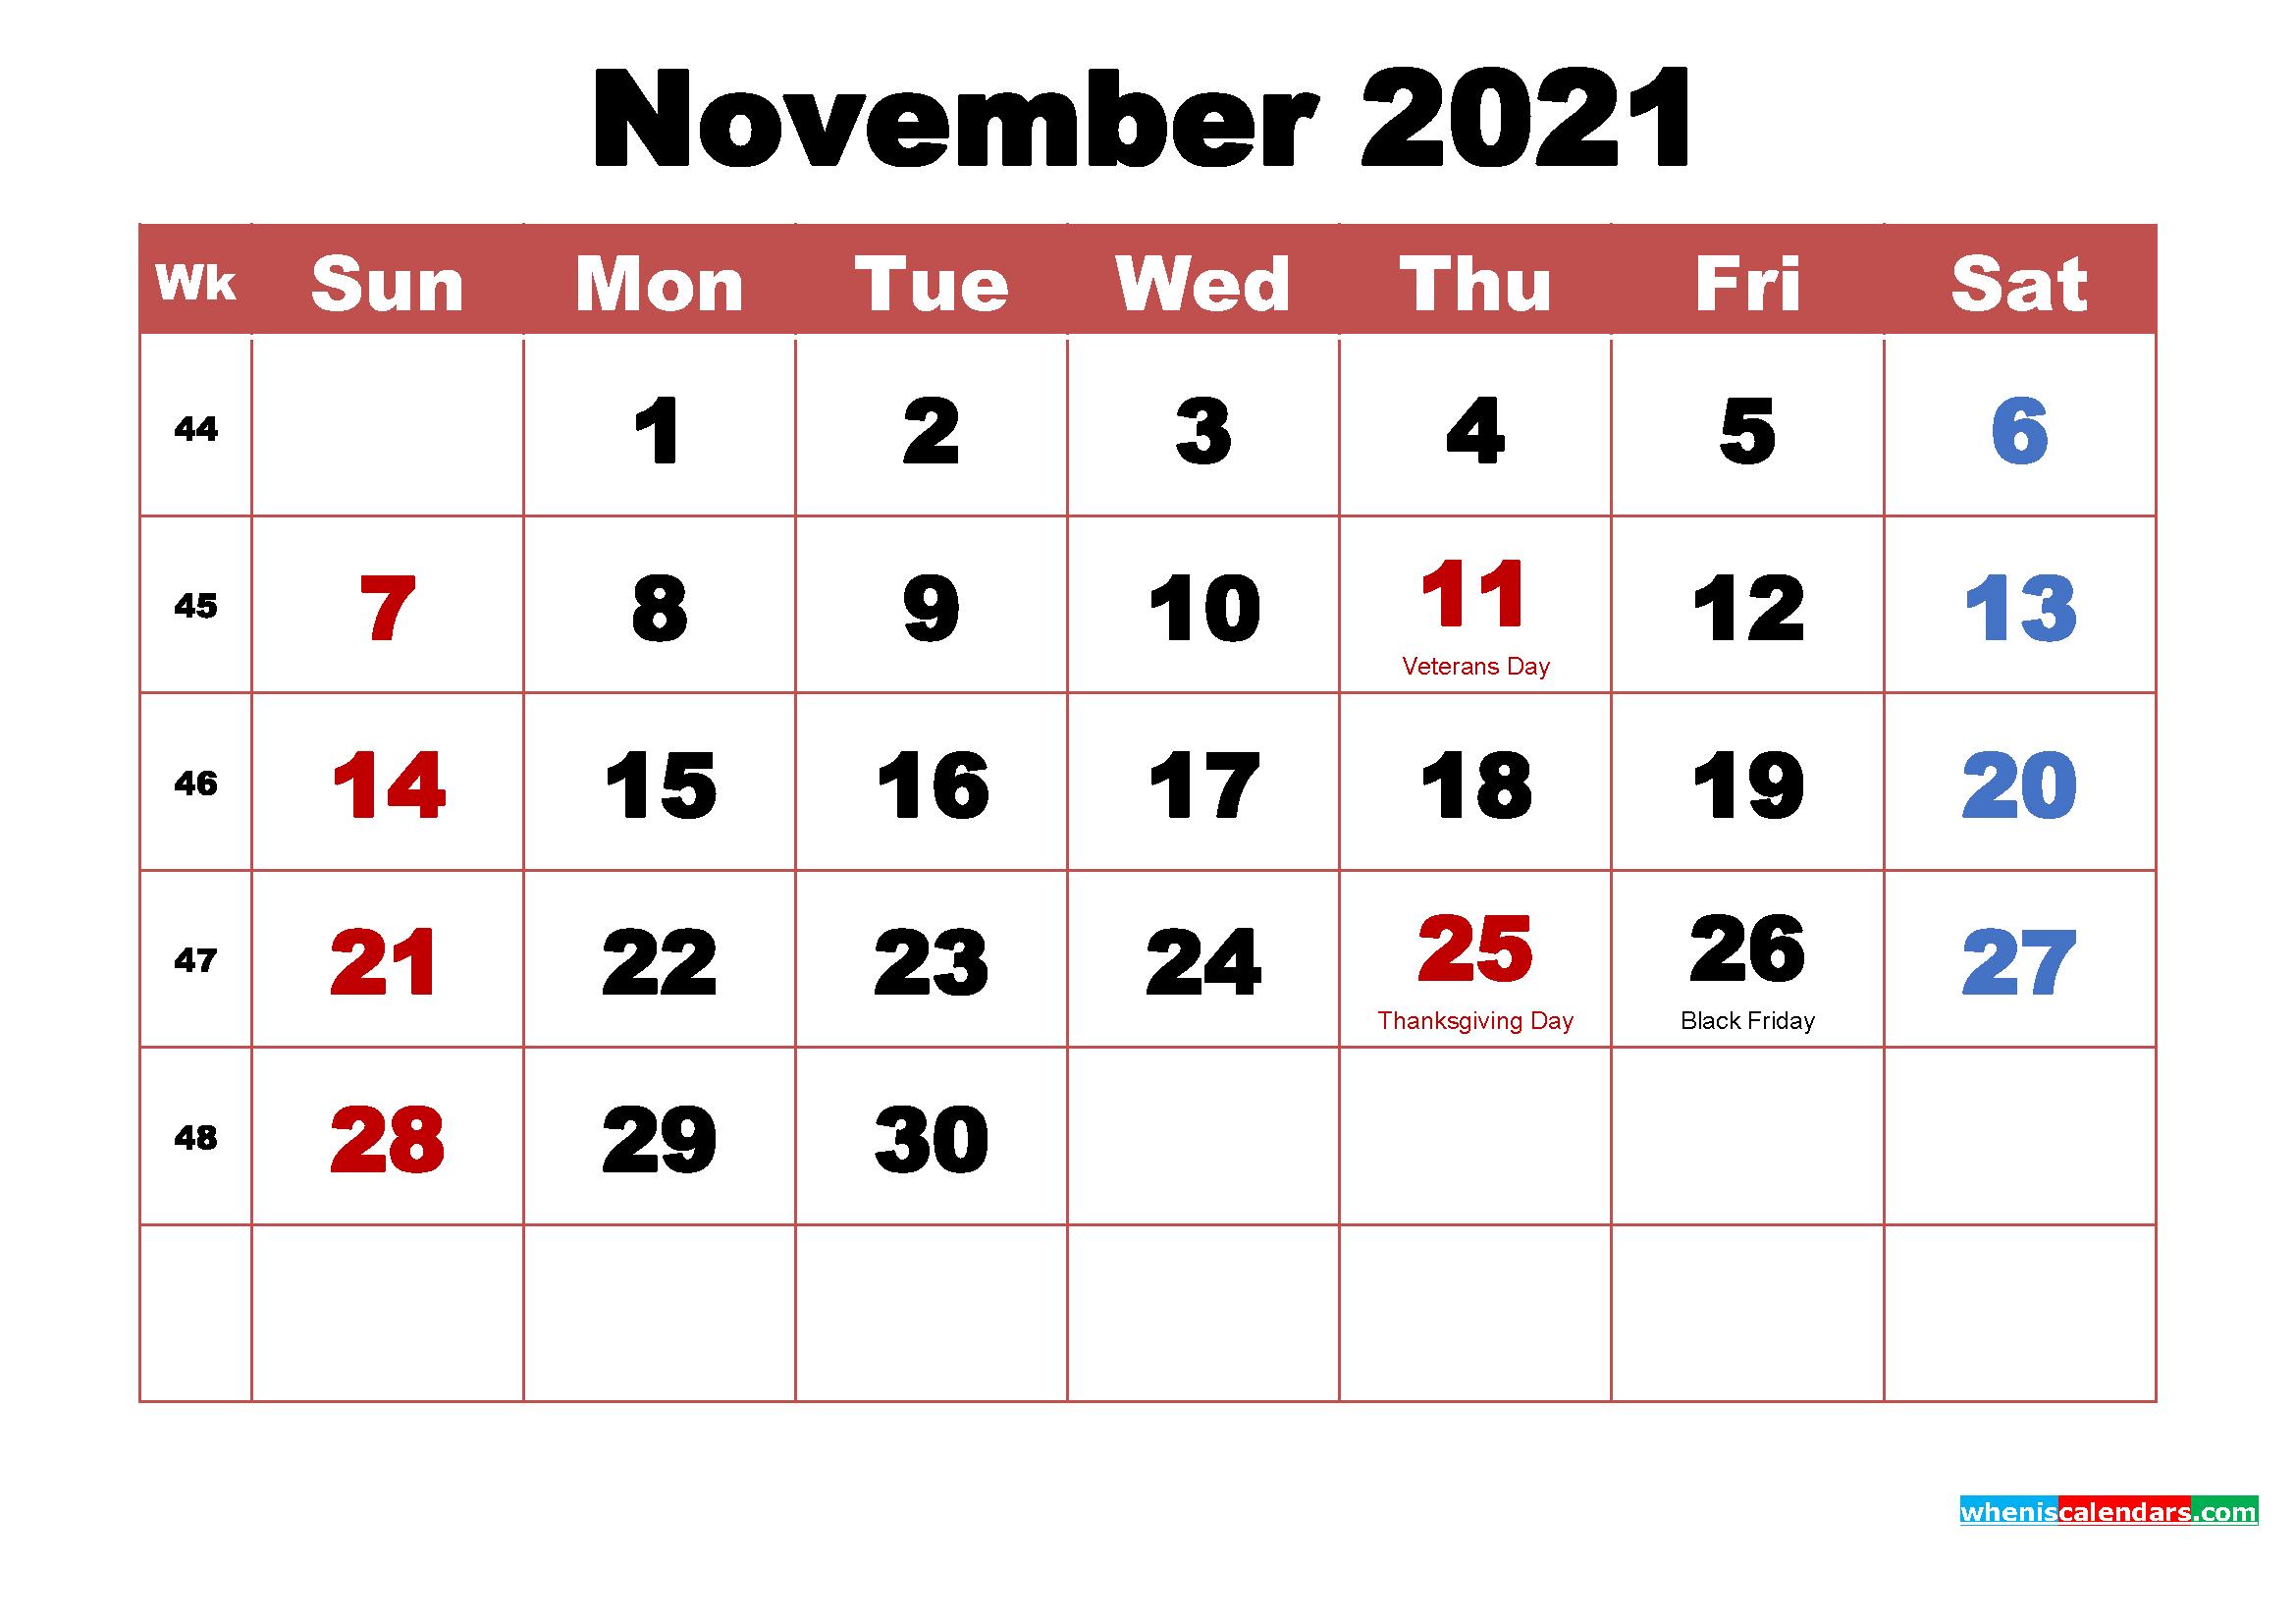 November 2021 Calendar With Holidays | 2021 Printable